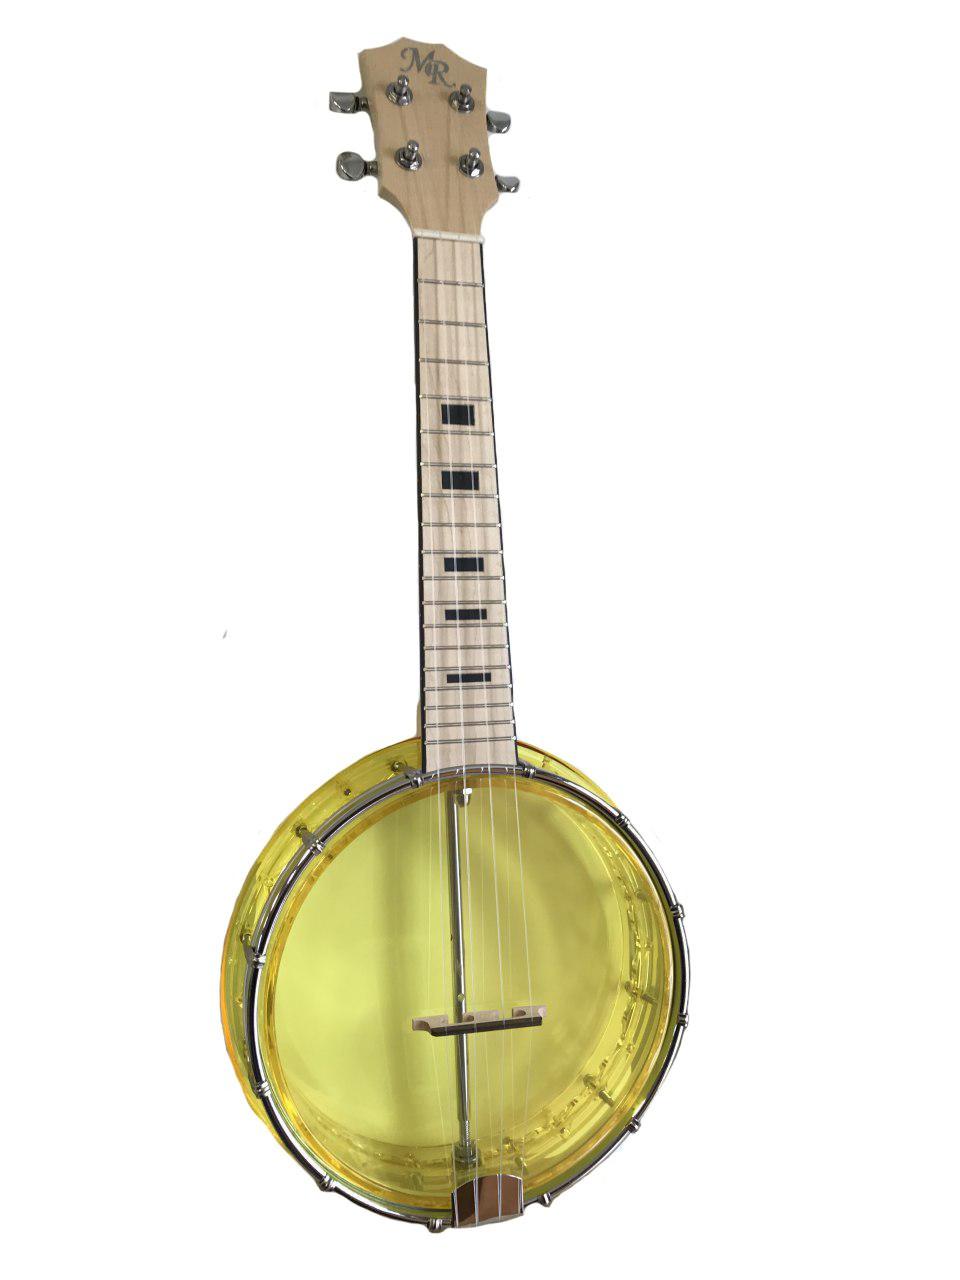 цена Банджолеле MARTIN ROMAS концертная, цвет: желтый, BP-1 YW онлайн в 2017 году